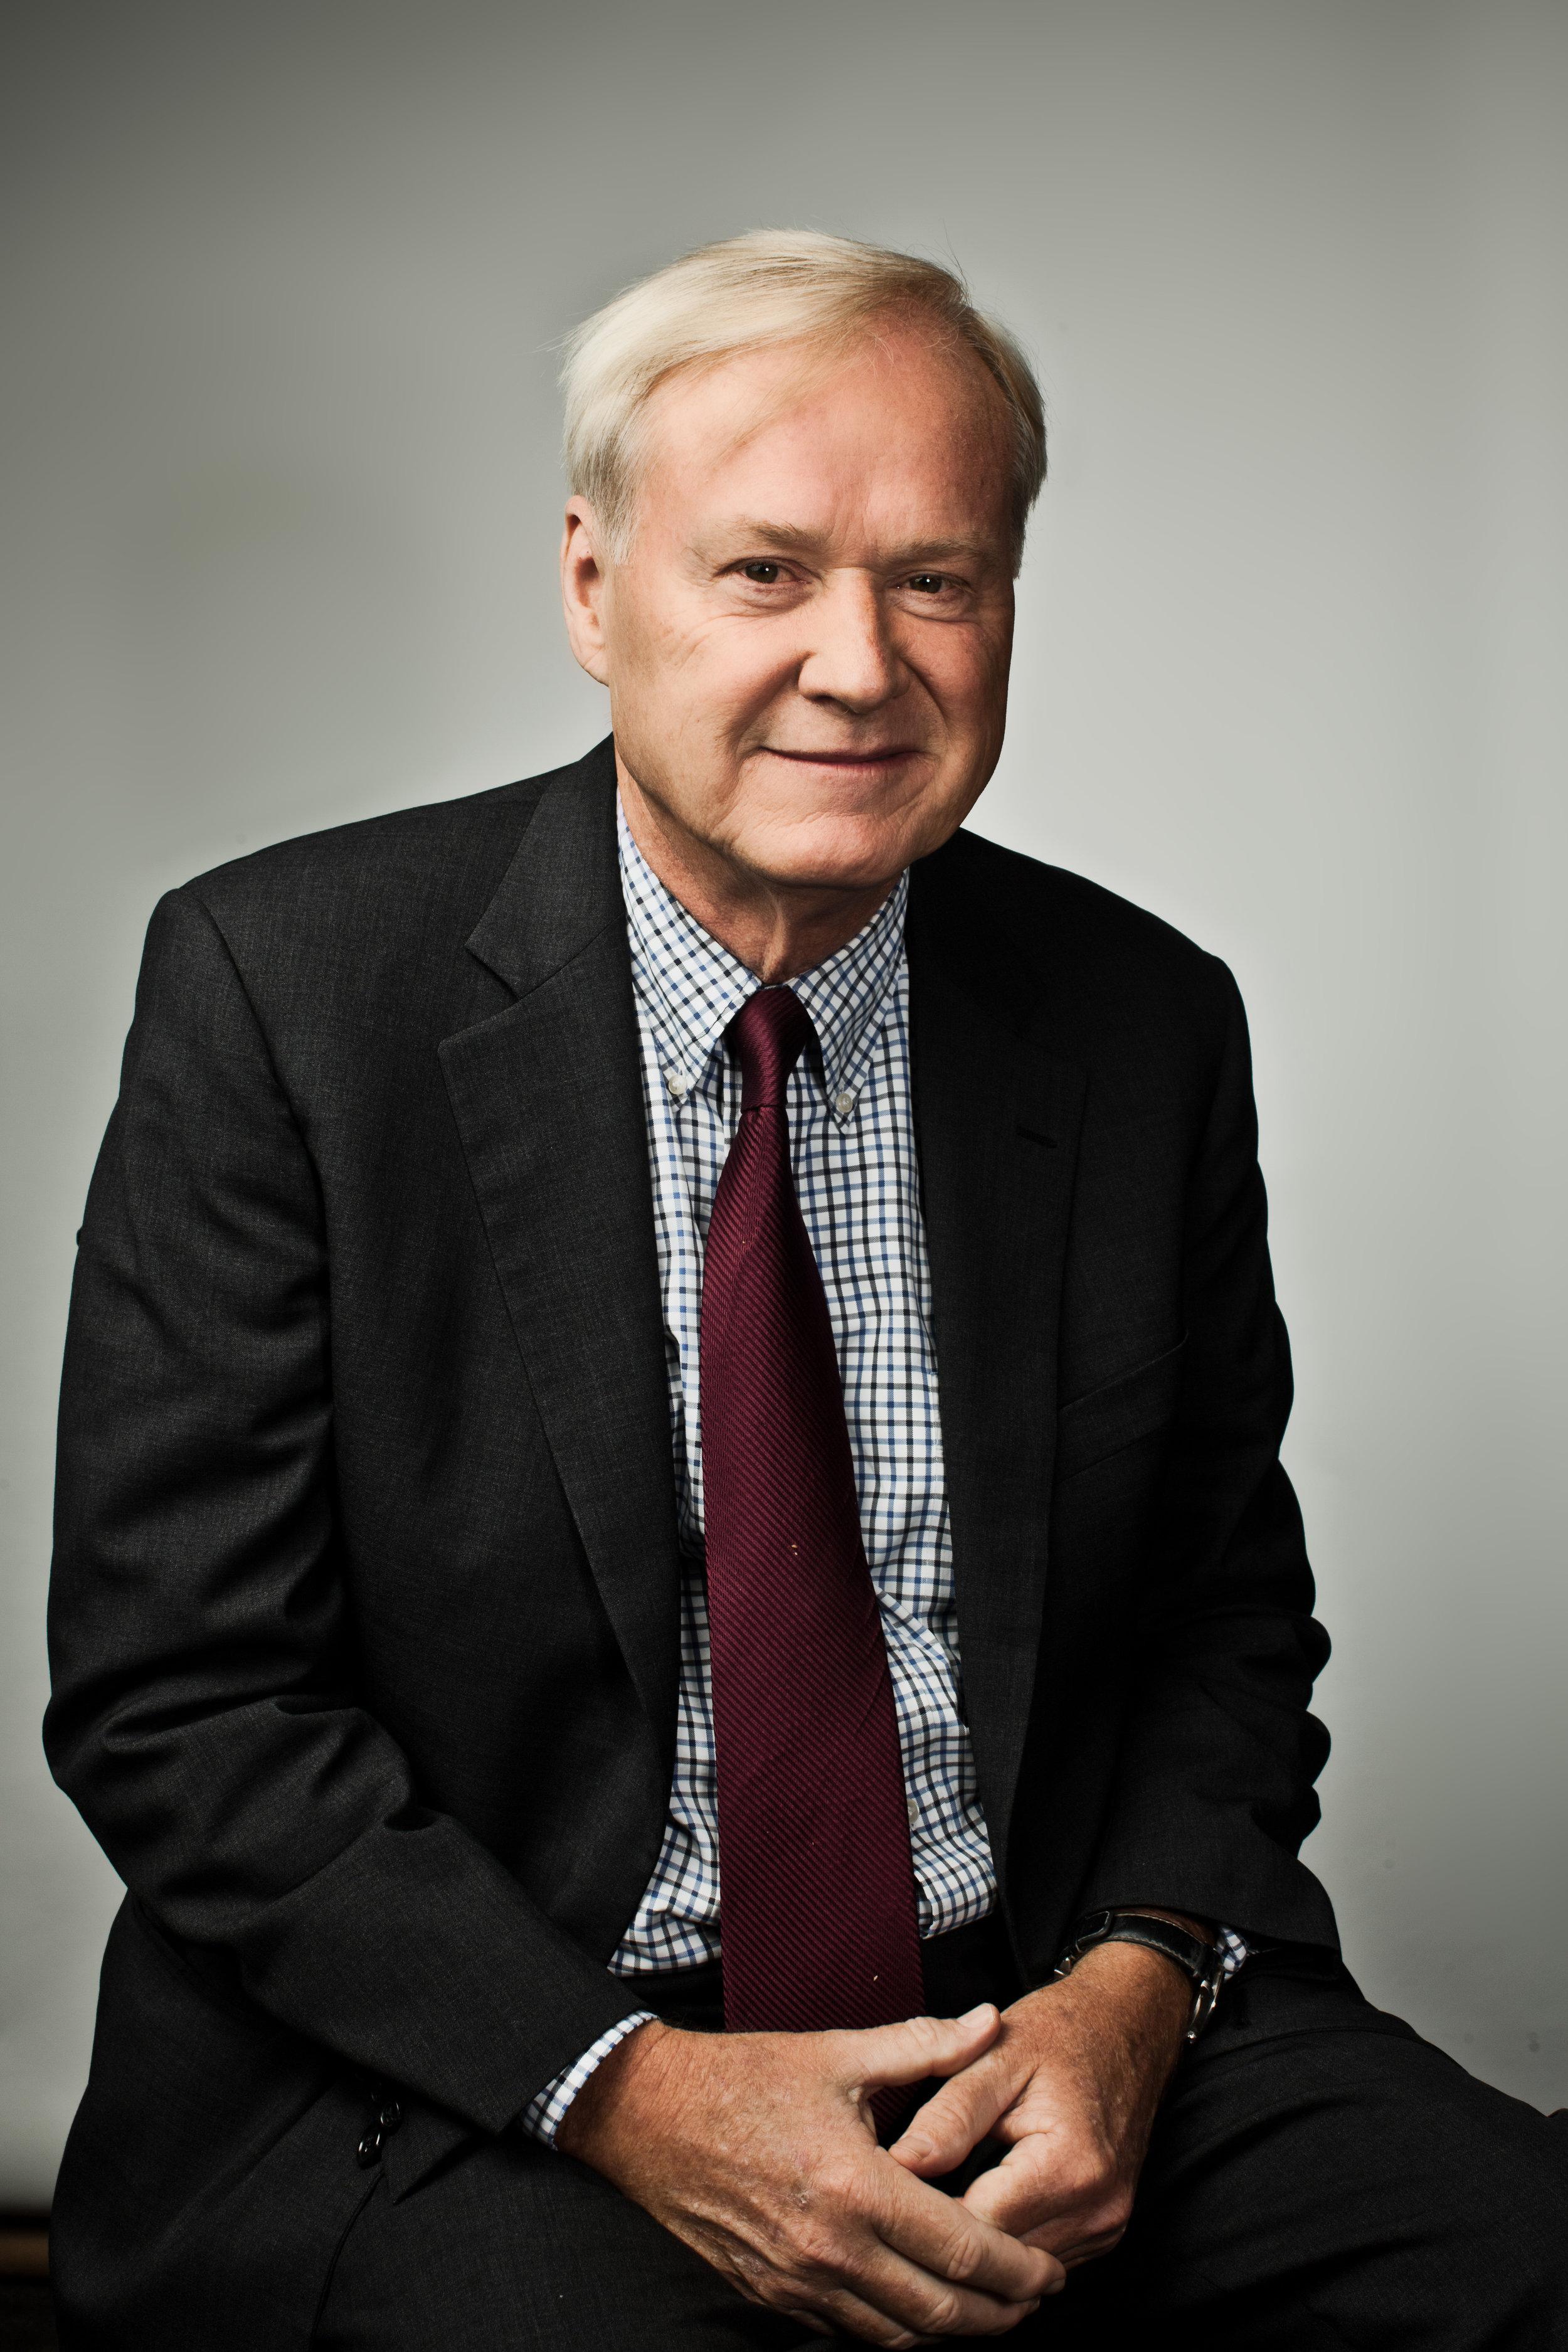 Journalist Chris Matthews